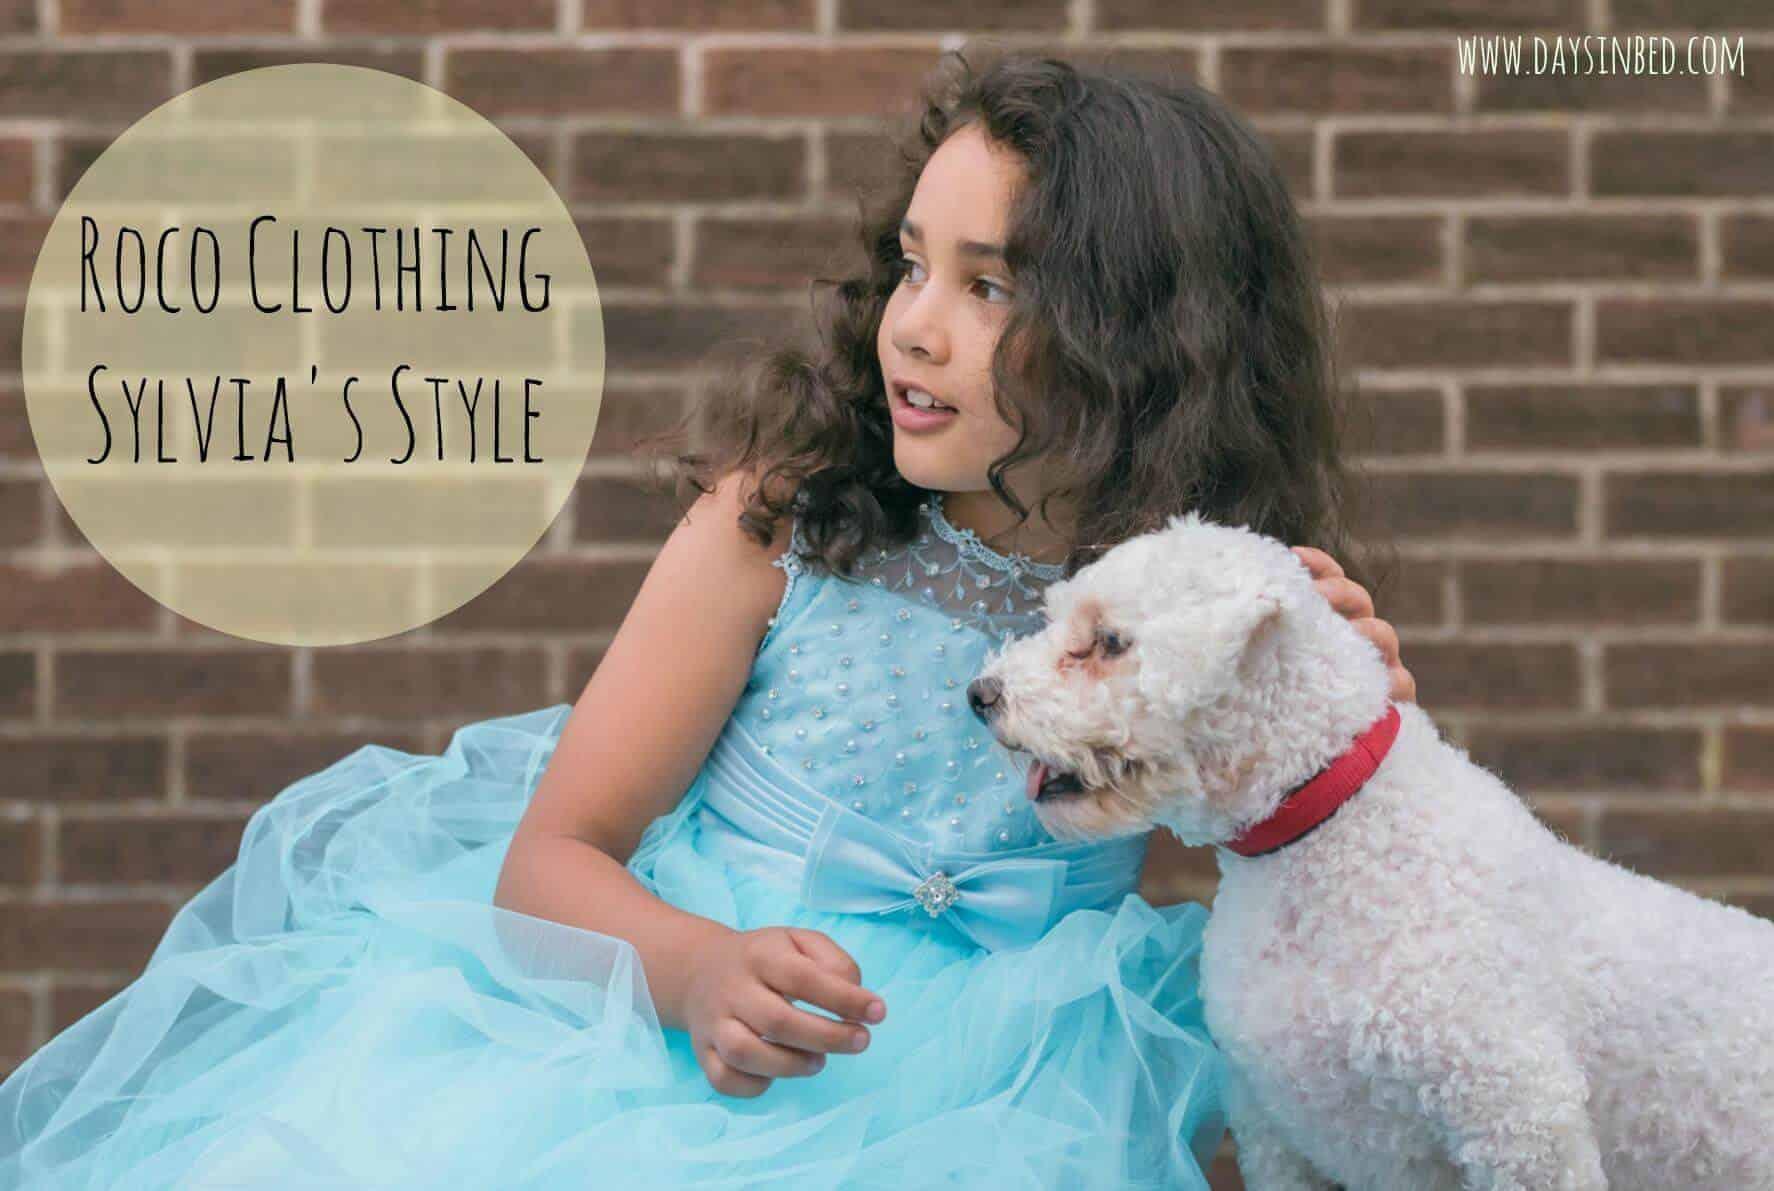 Roco Clothing flower girl dress